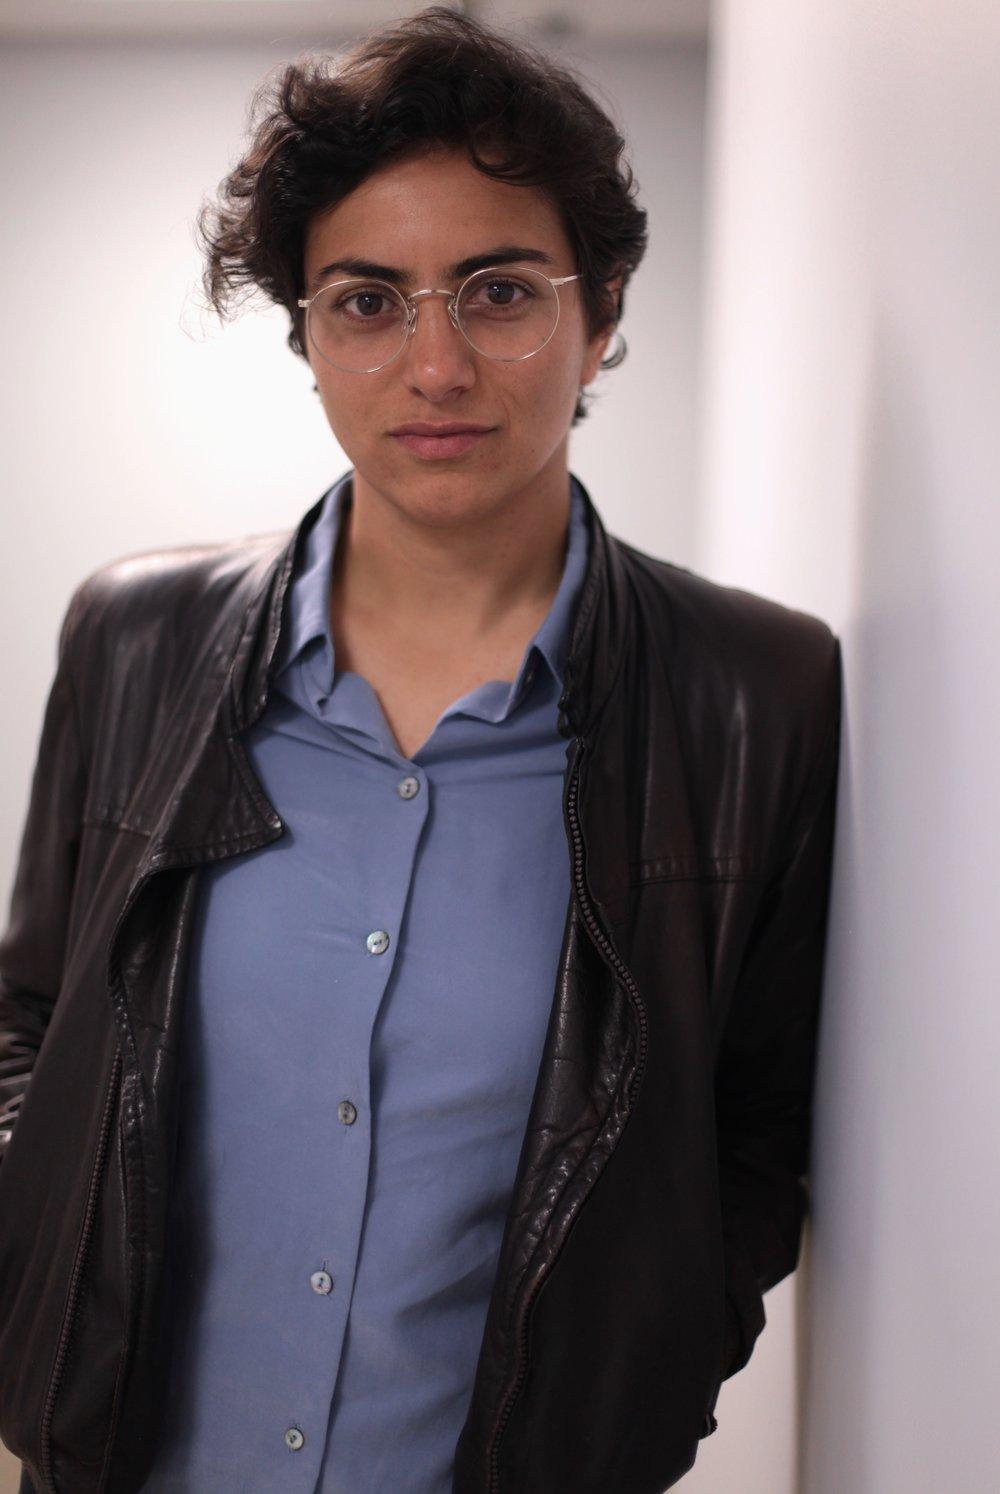 Nayrouz Abu Hatoum